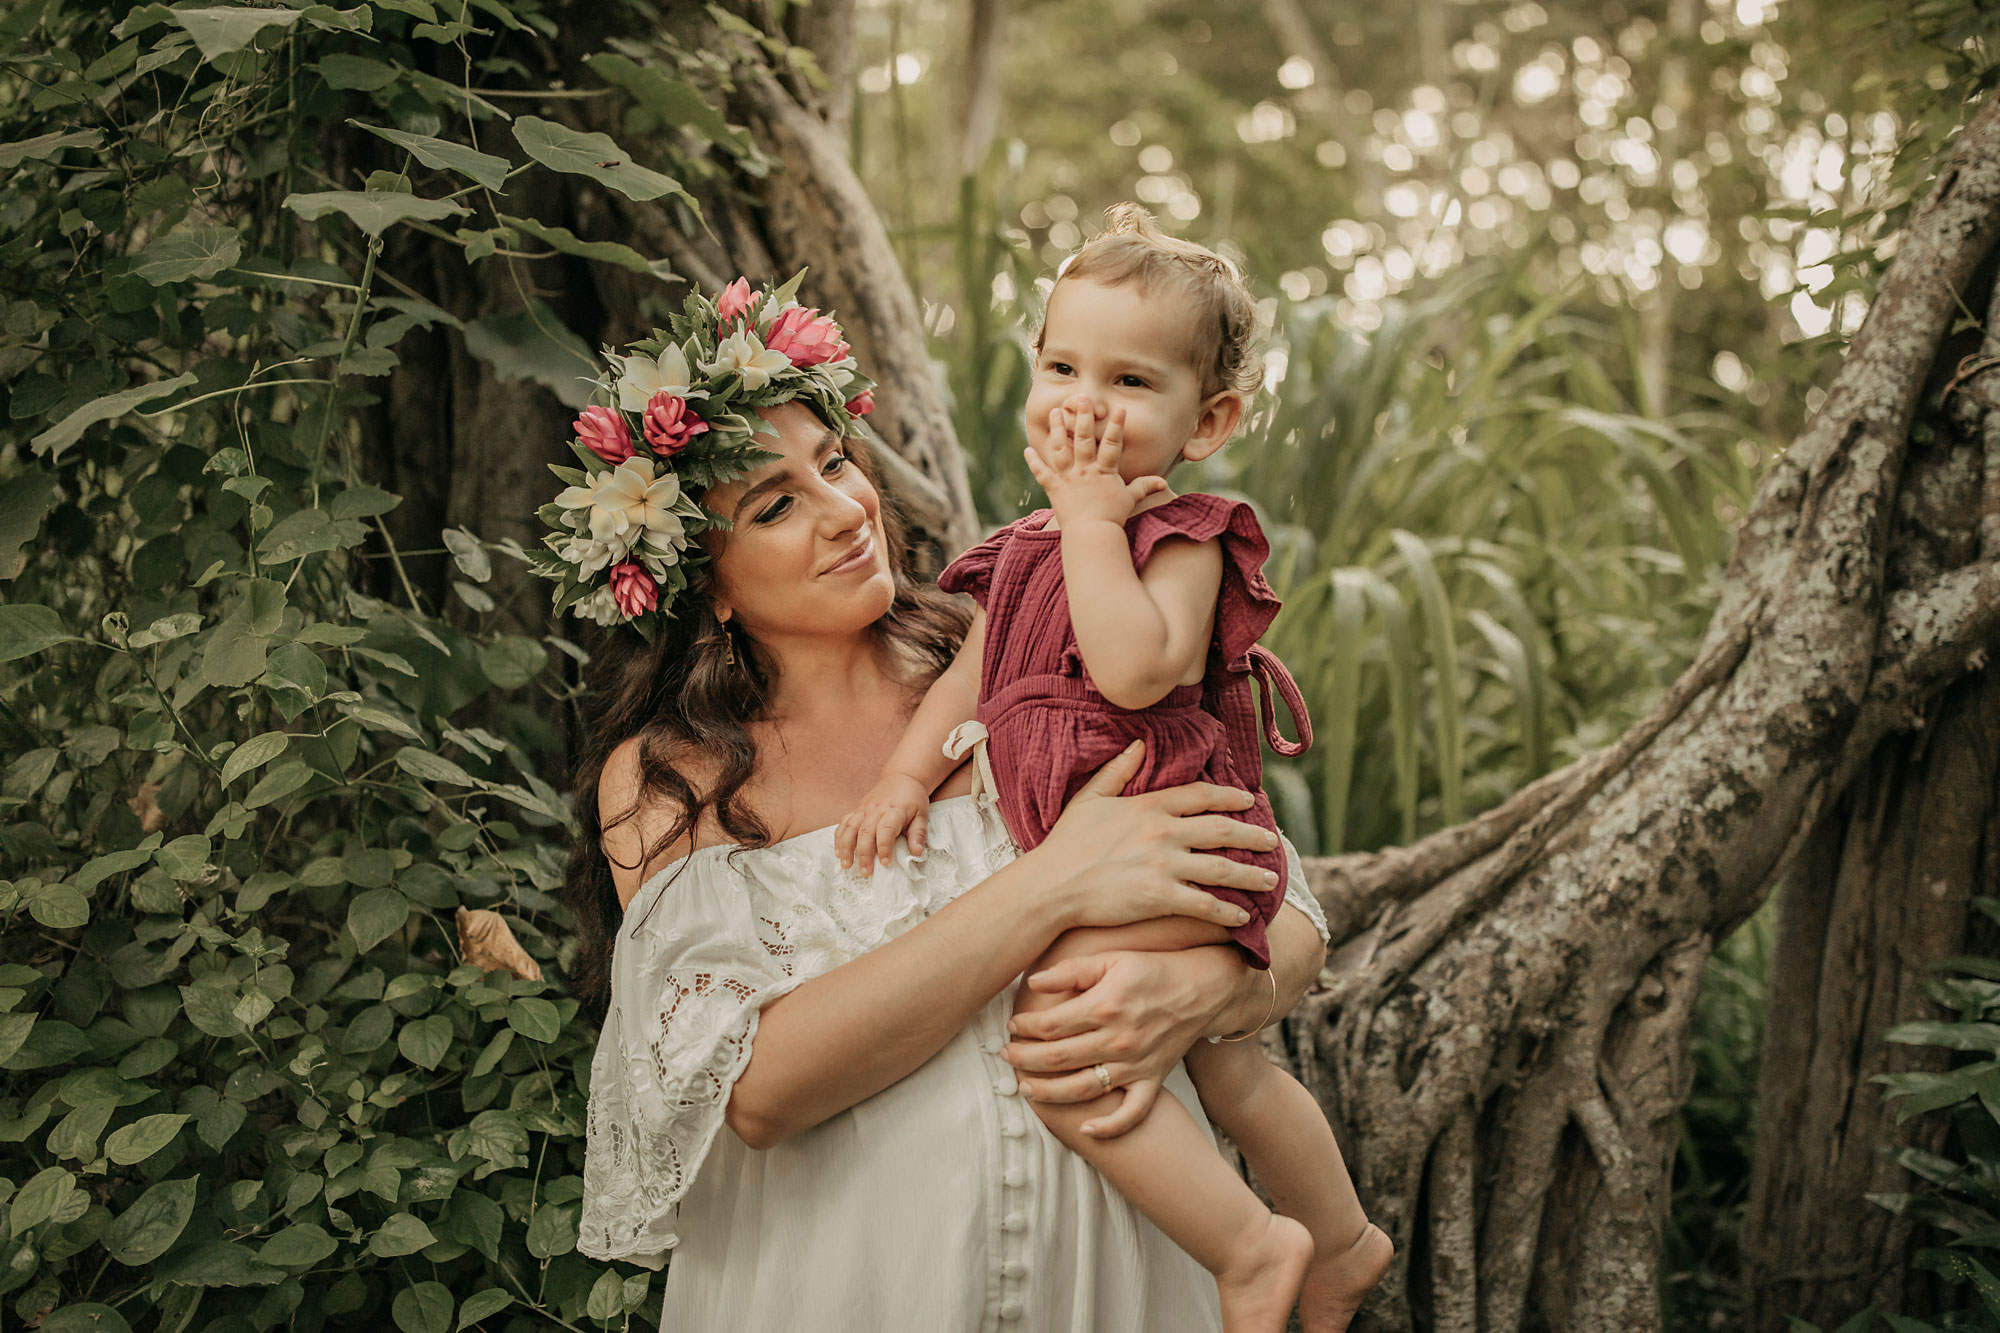 Hawaii-Oahu-Maternity-Photography-The-Sophia-Co-007.jpg